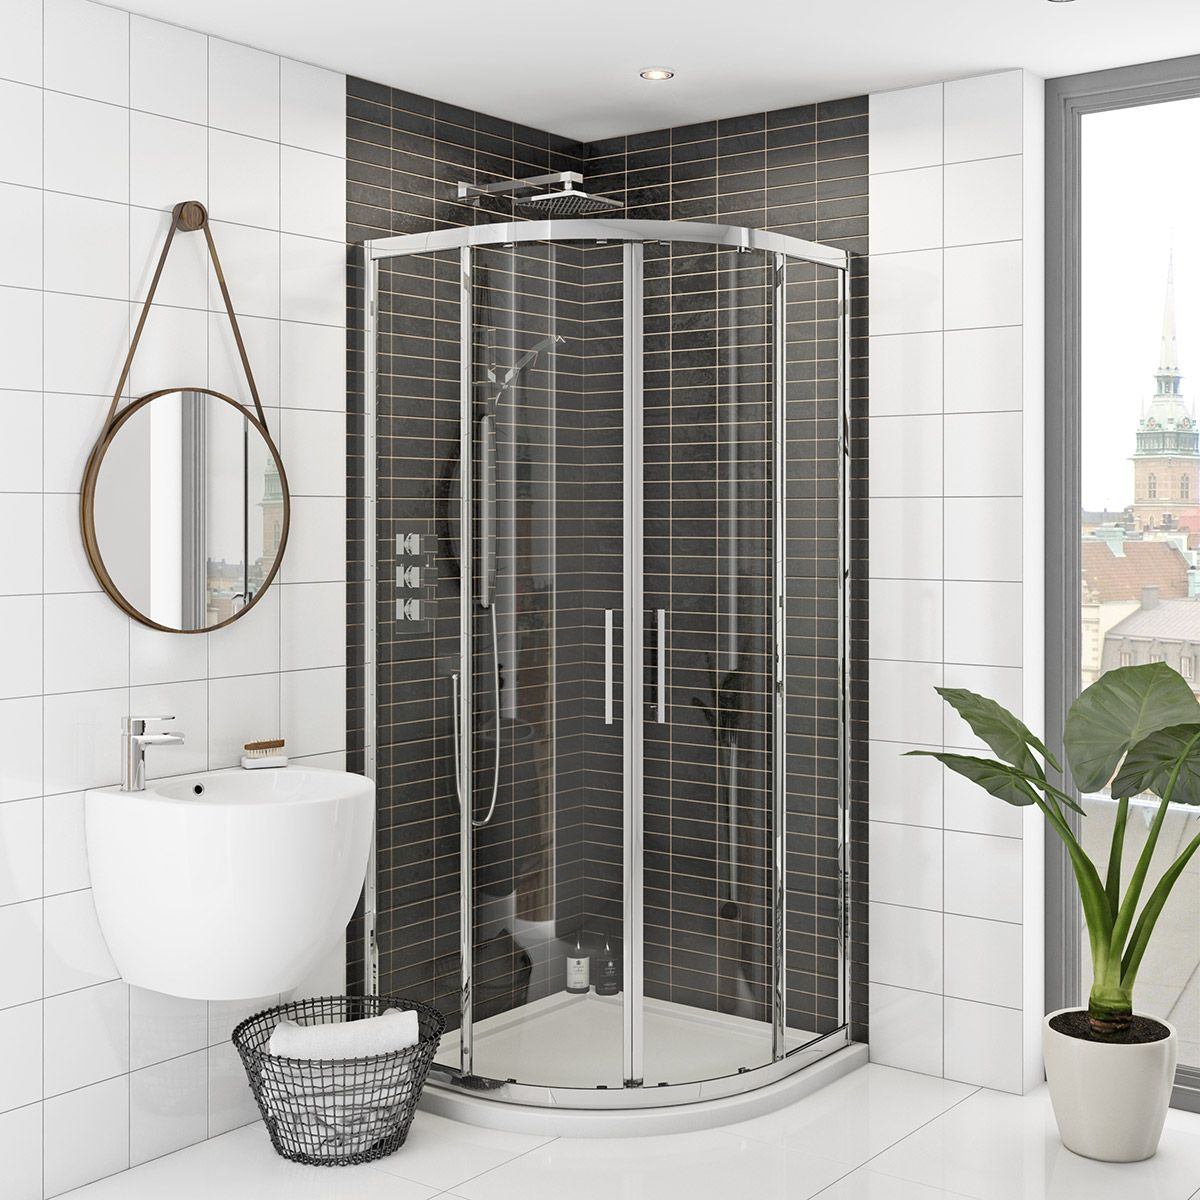 Mode Hardy premium 8mm easy clean quadrant shower enclosure ...